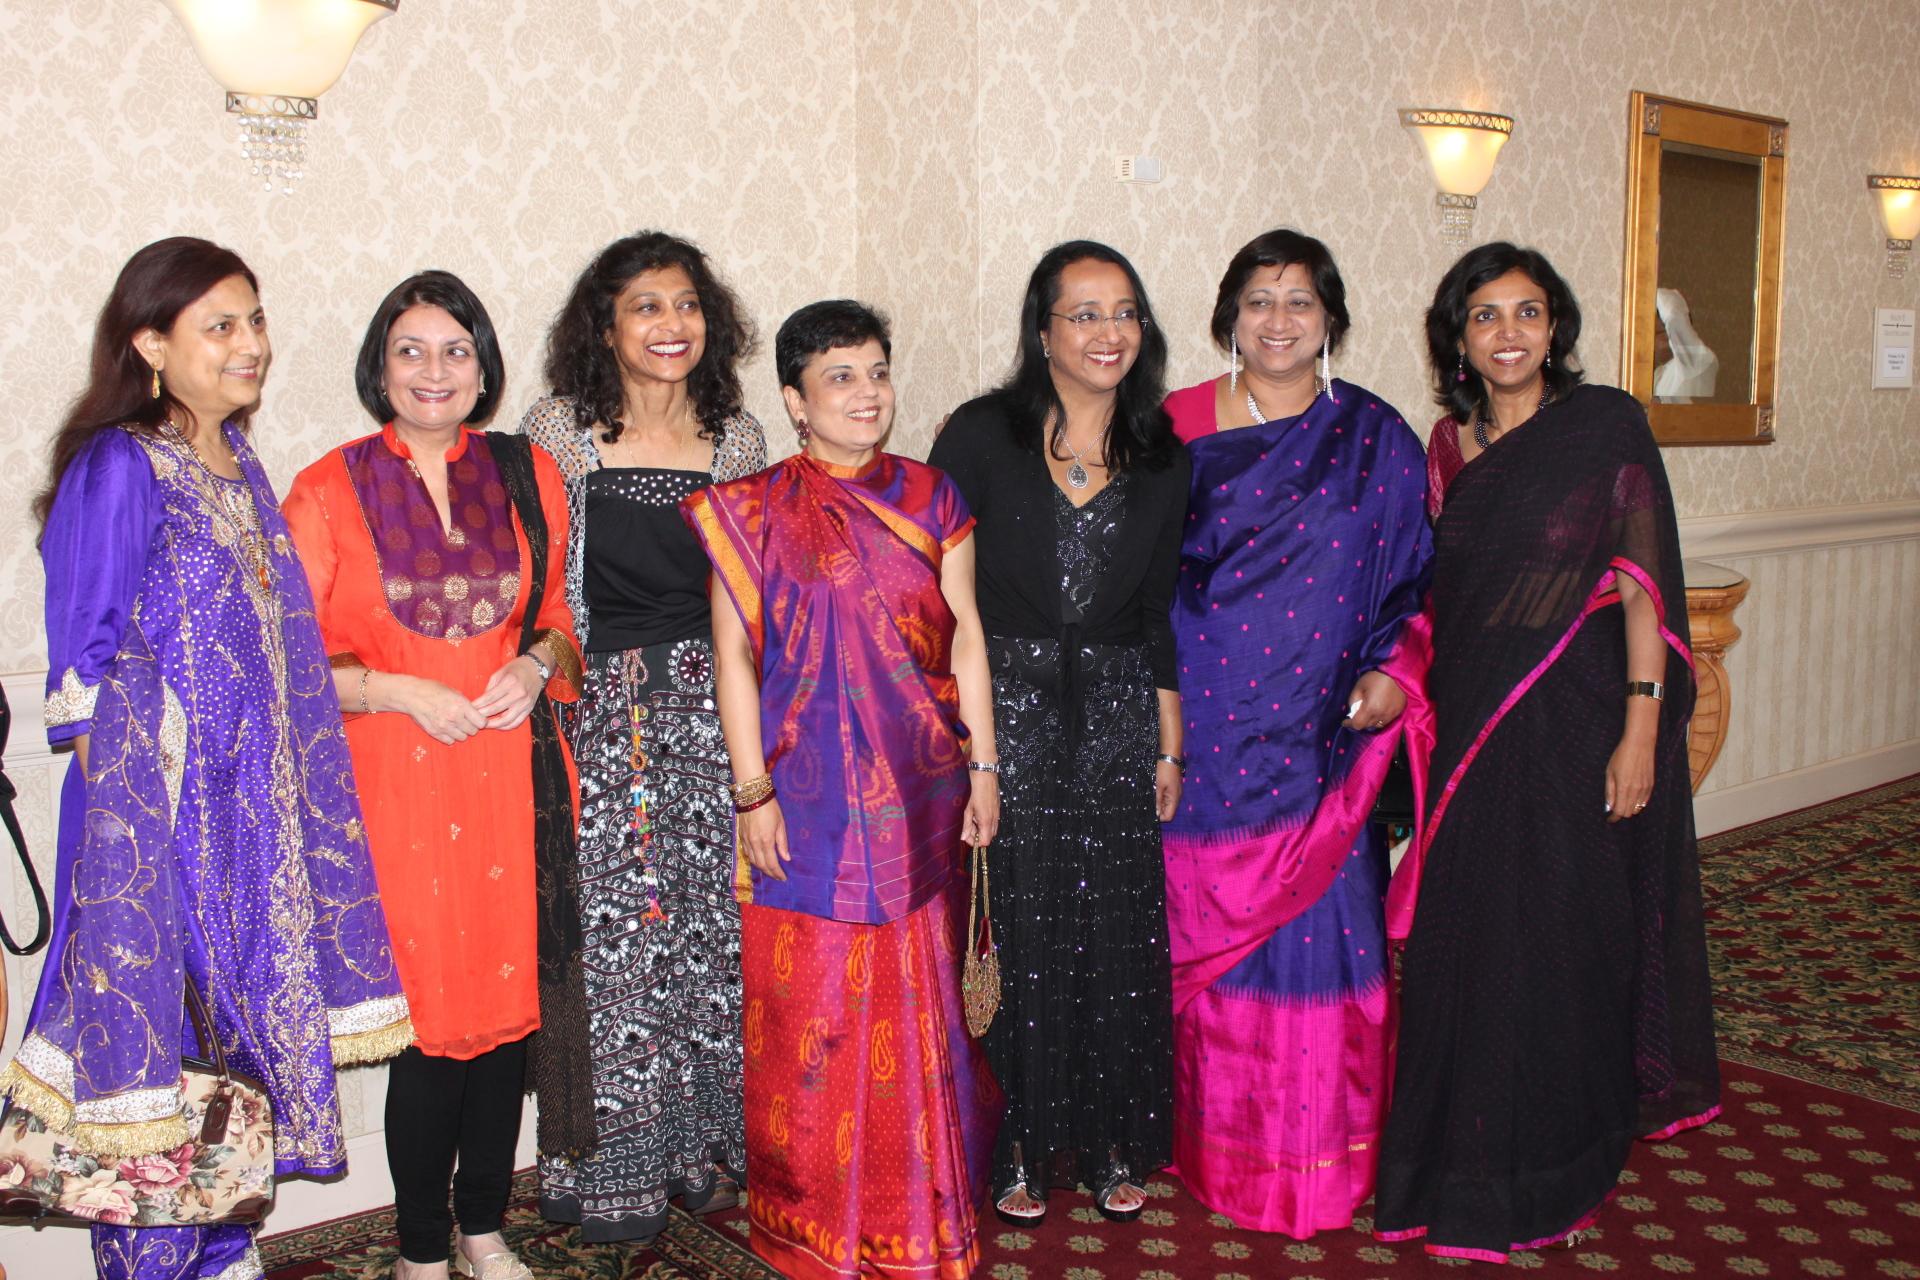 The Ladies in 2014